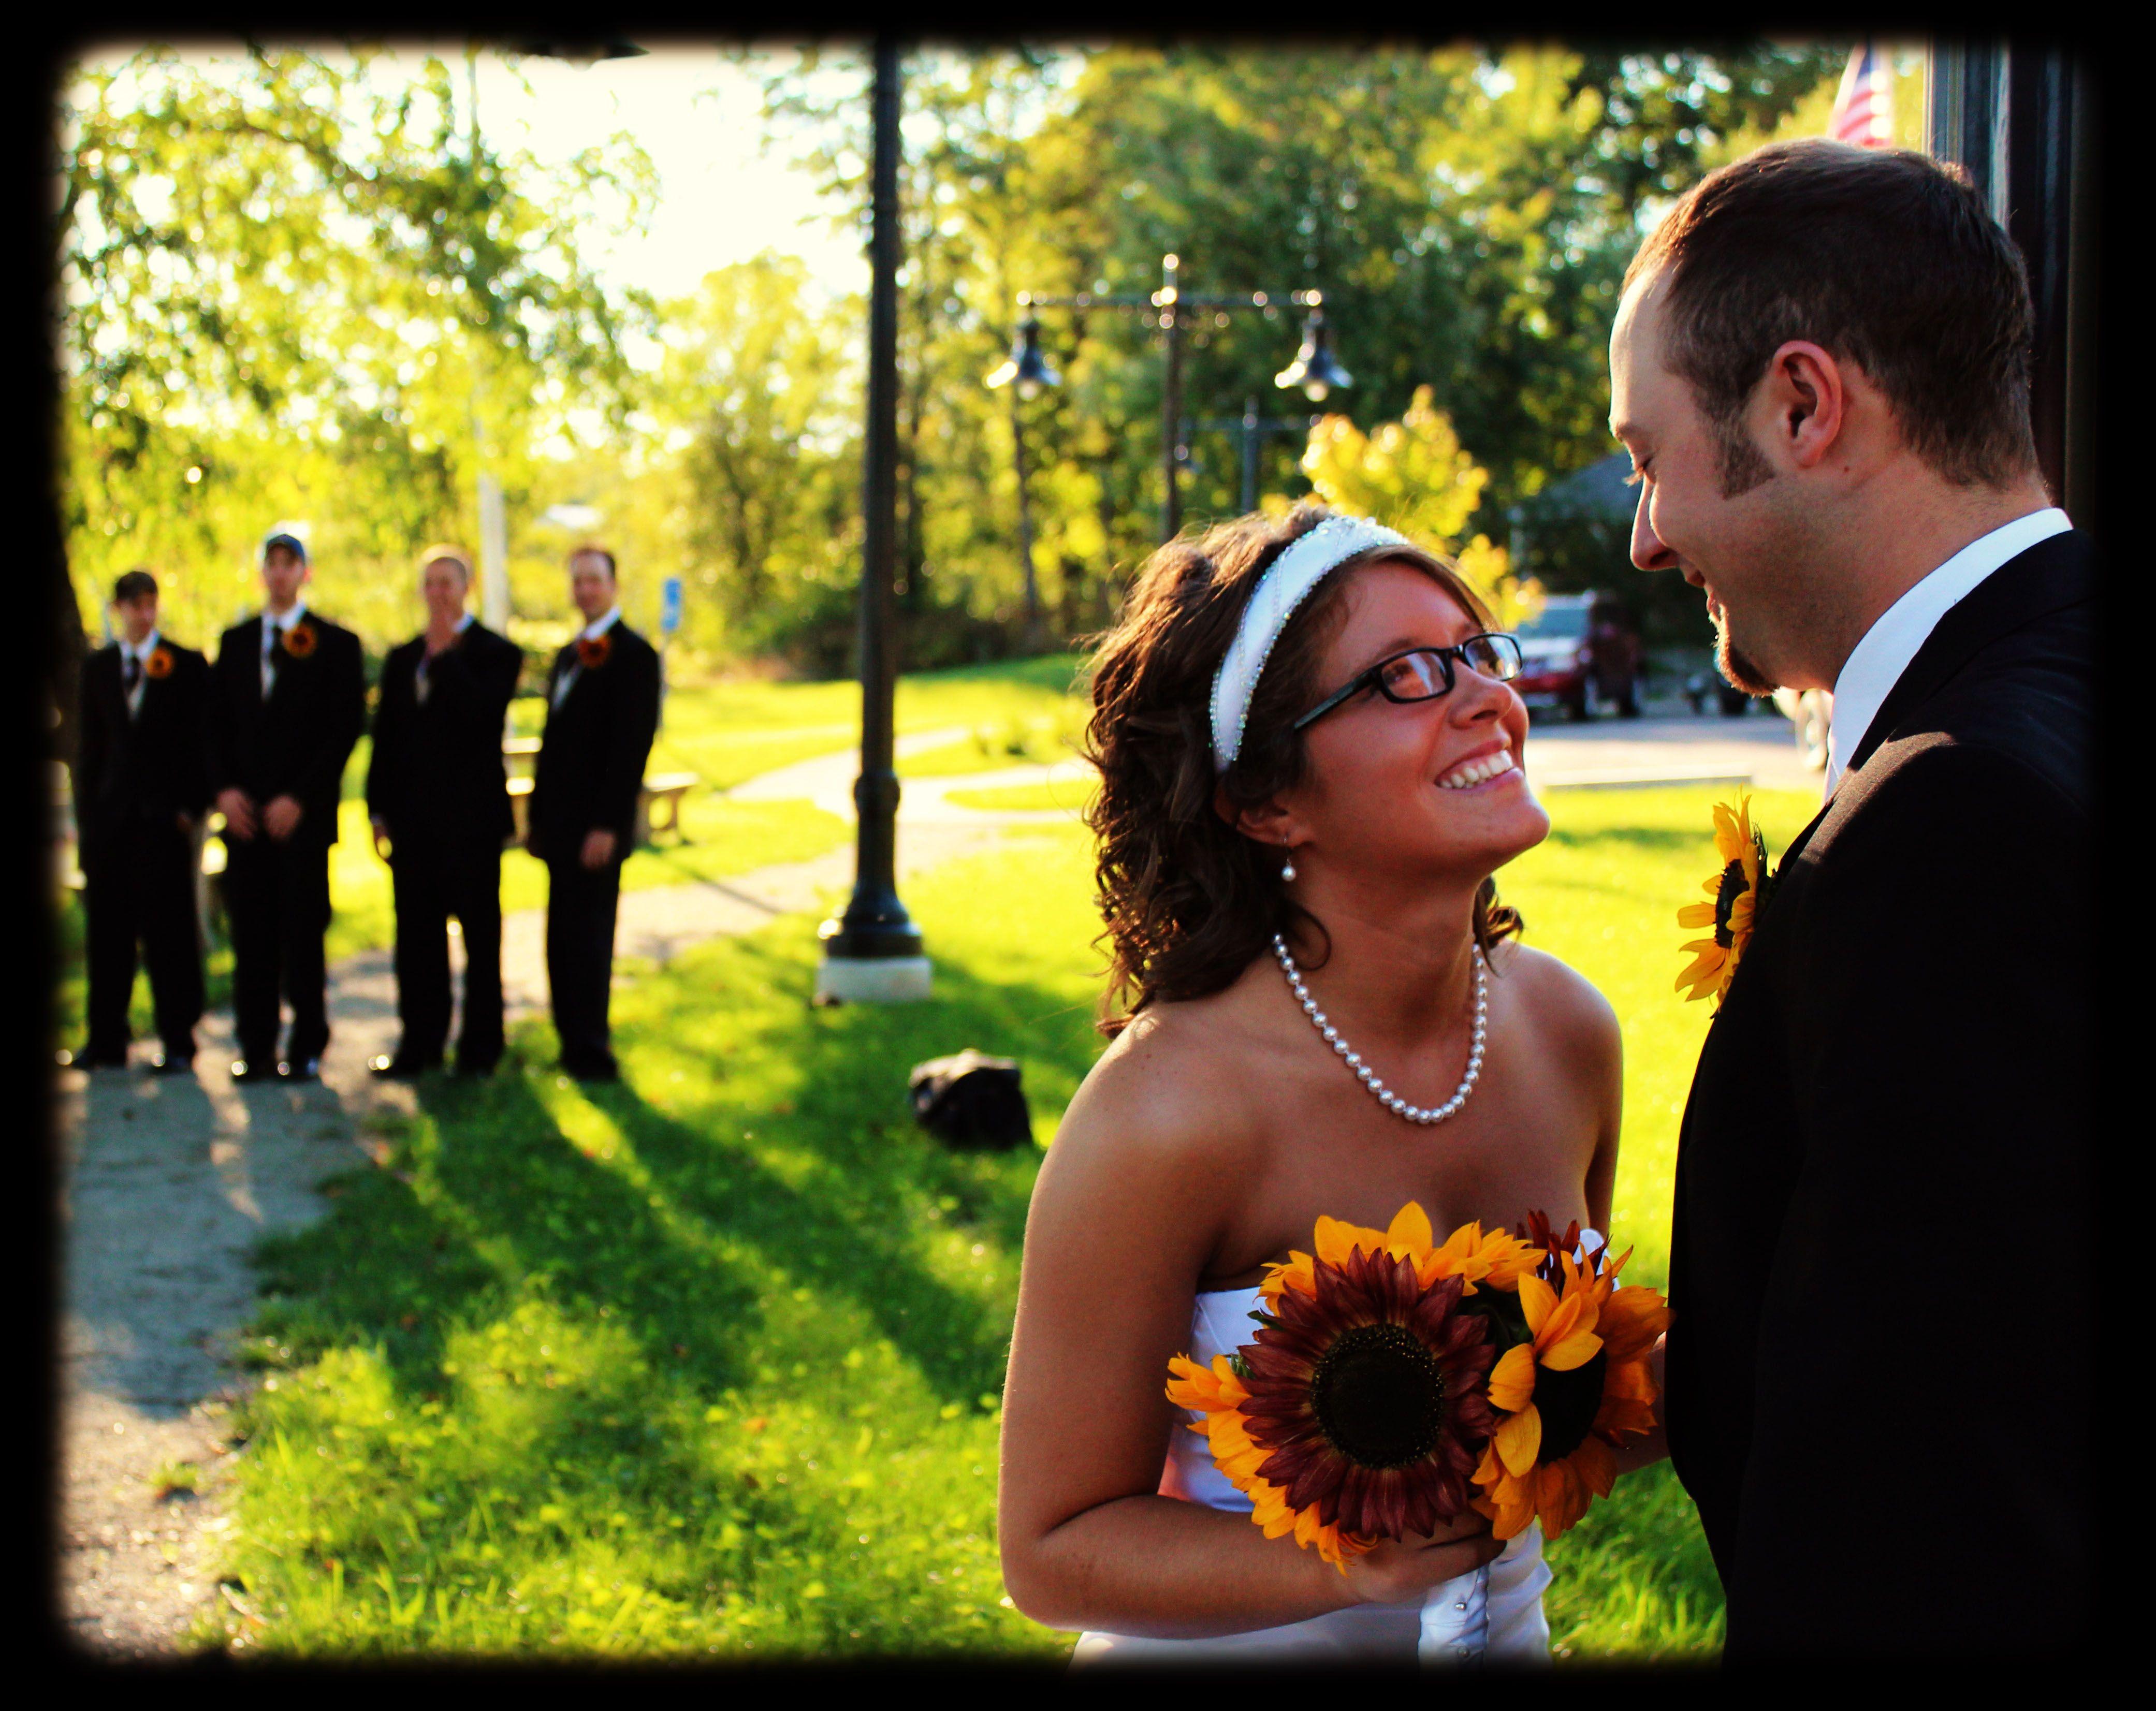 Wedding Pose One Stop Wedding Wedding Poses Wedding Photography Poses Wedding Photos Poses